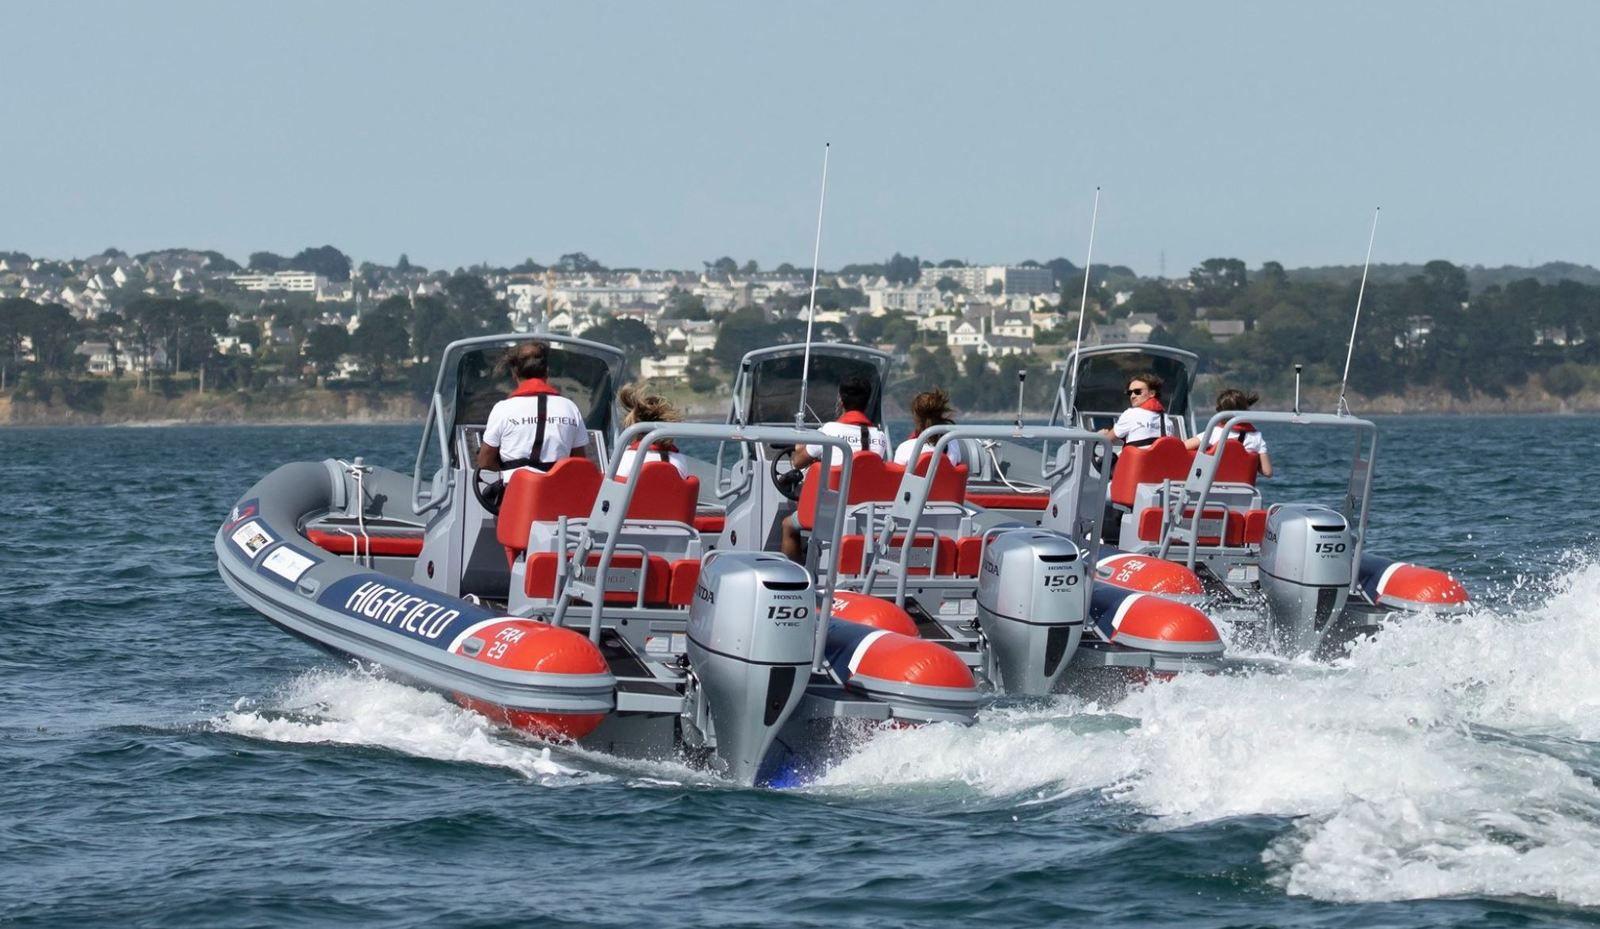 48 Highfield-Honda RIBs for the Vendee Globe 2020 safety boat fleet